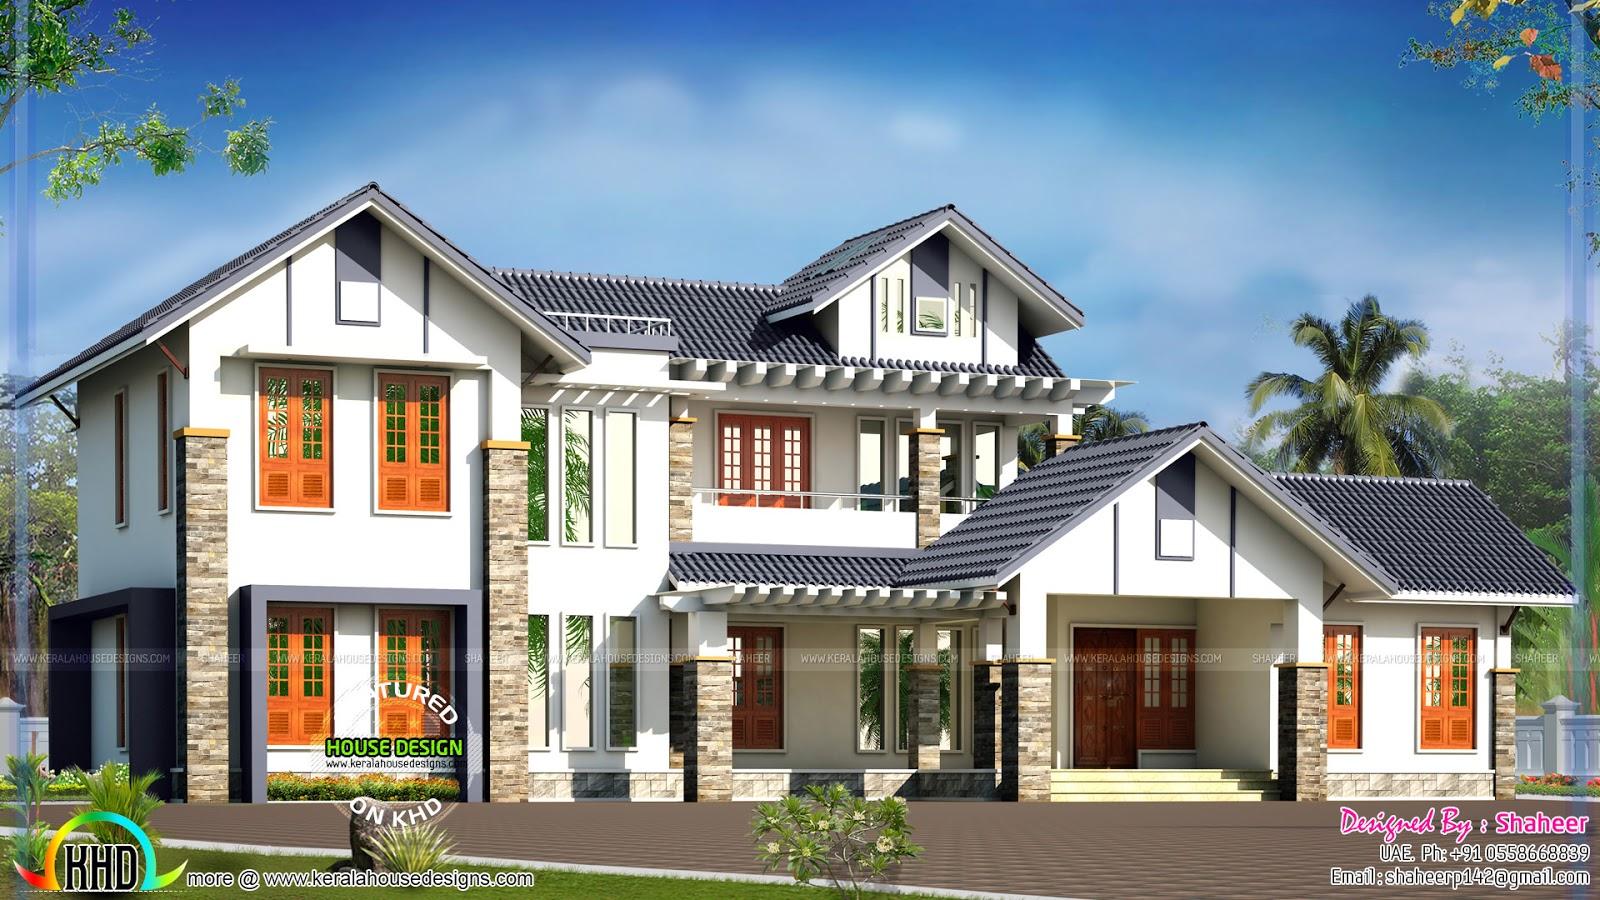 Best uae home design gallery interior design ideas for Modern house uae